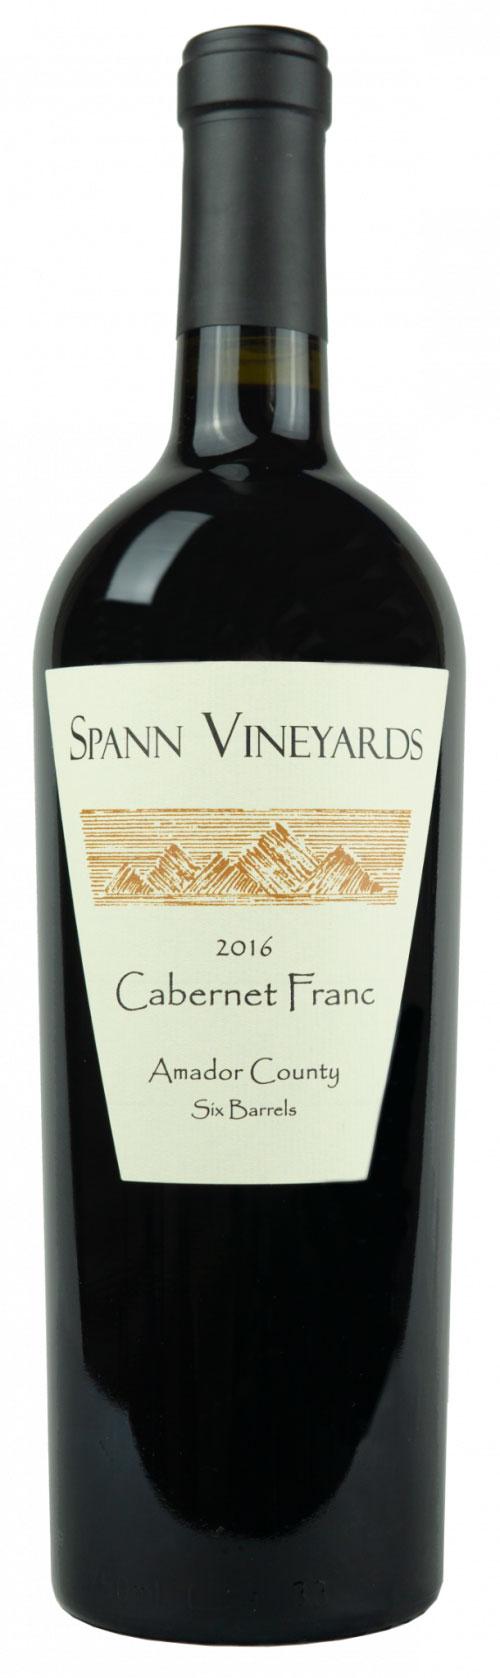 spann-vineyards-2016-cabernet-franc-copy